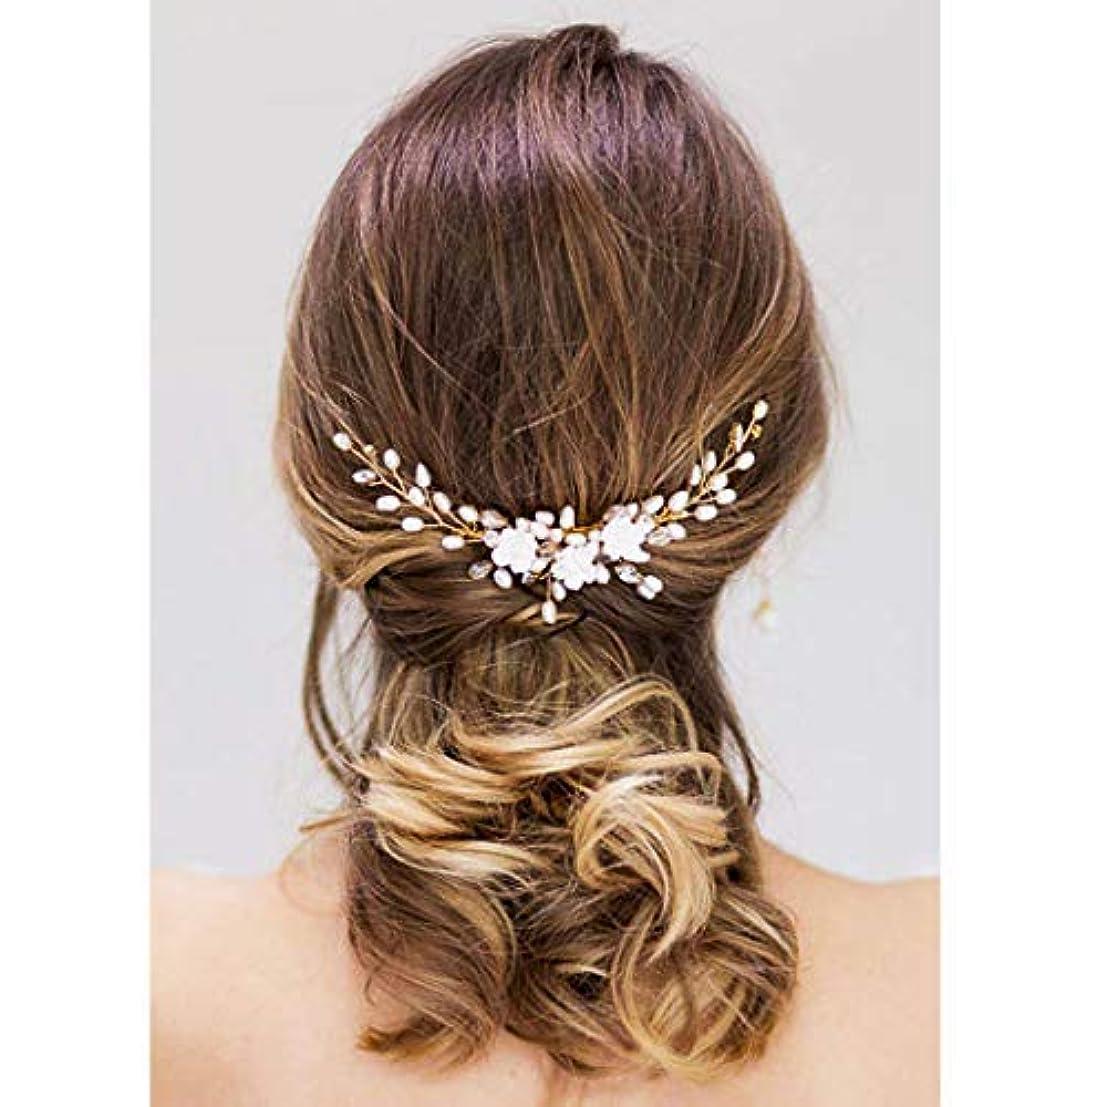 Drecode Bride Wedding Hair Comb Flower Headpiece Pearl Rhinestone Hair Accessories for Women and Girls [並行輸入品]